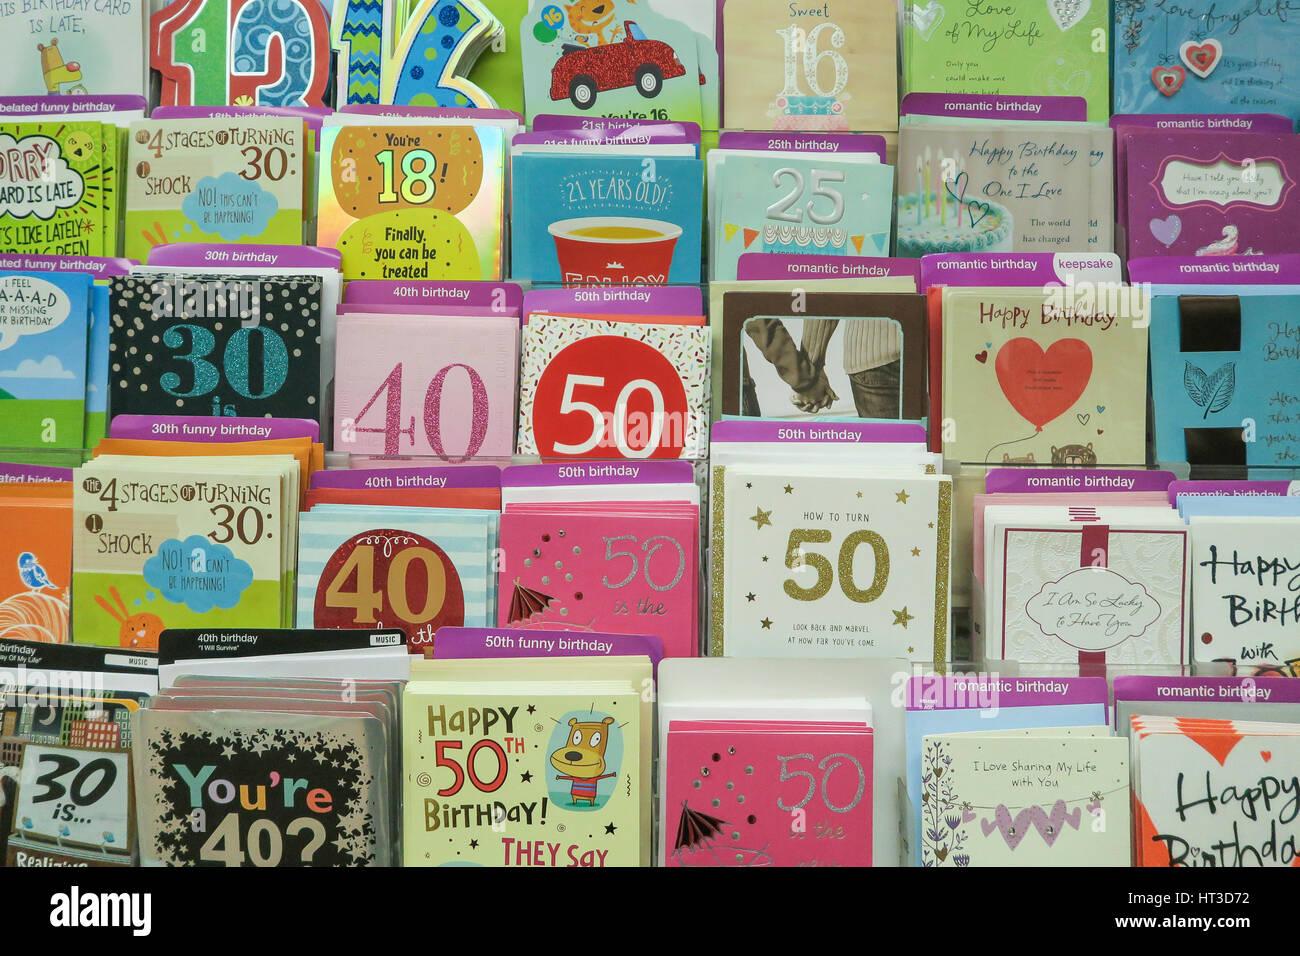 milestone birthday cards at kmart nyc usa stock photo 135300566